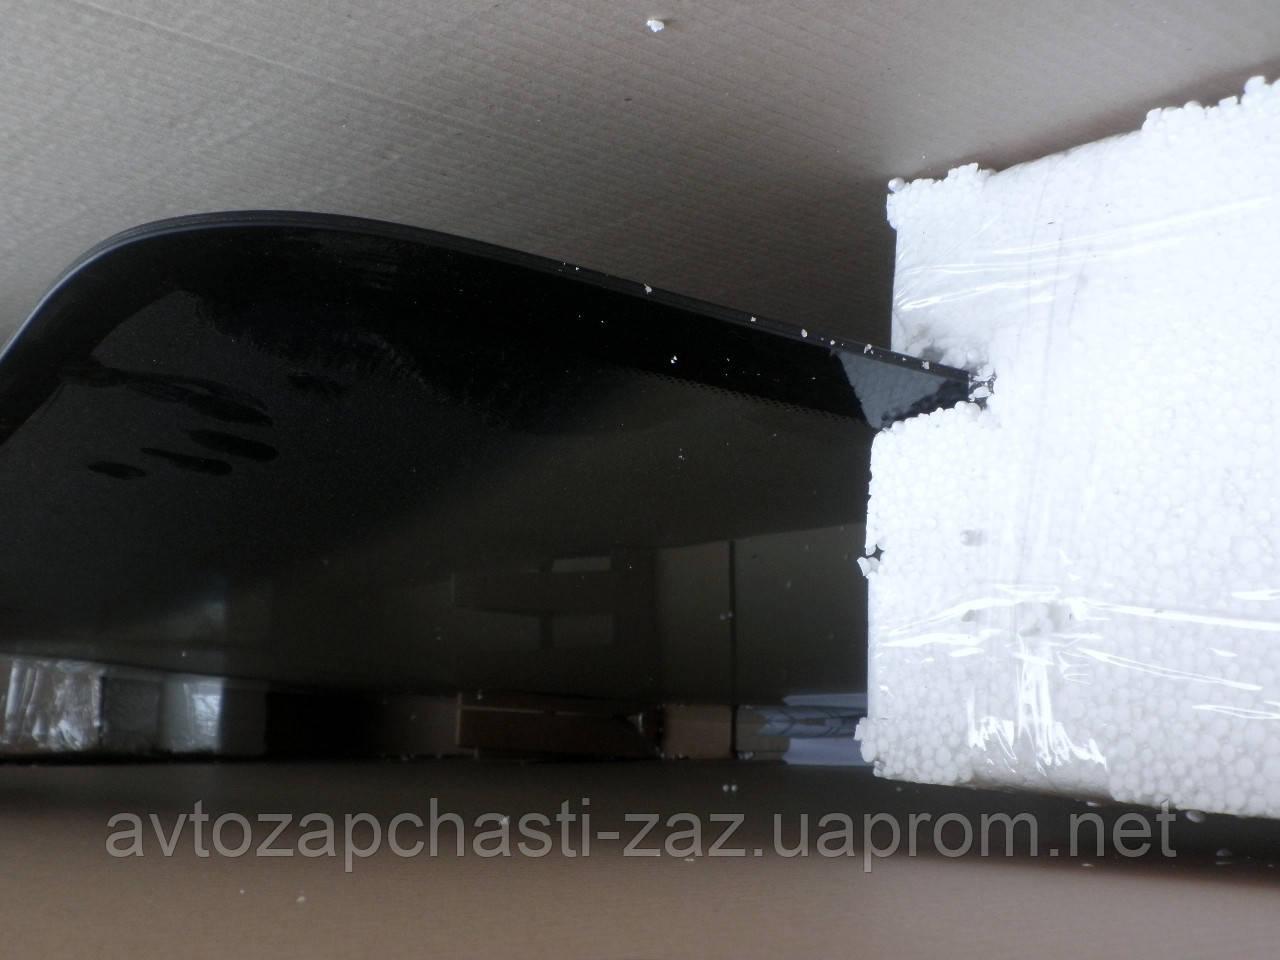 Замена лобового стекла — Chevrolet Aveo Sedan, 1.5 л., 2007 ... | 960x1280